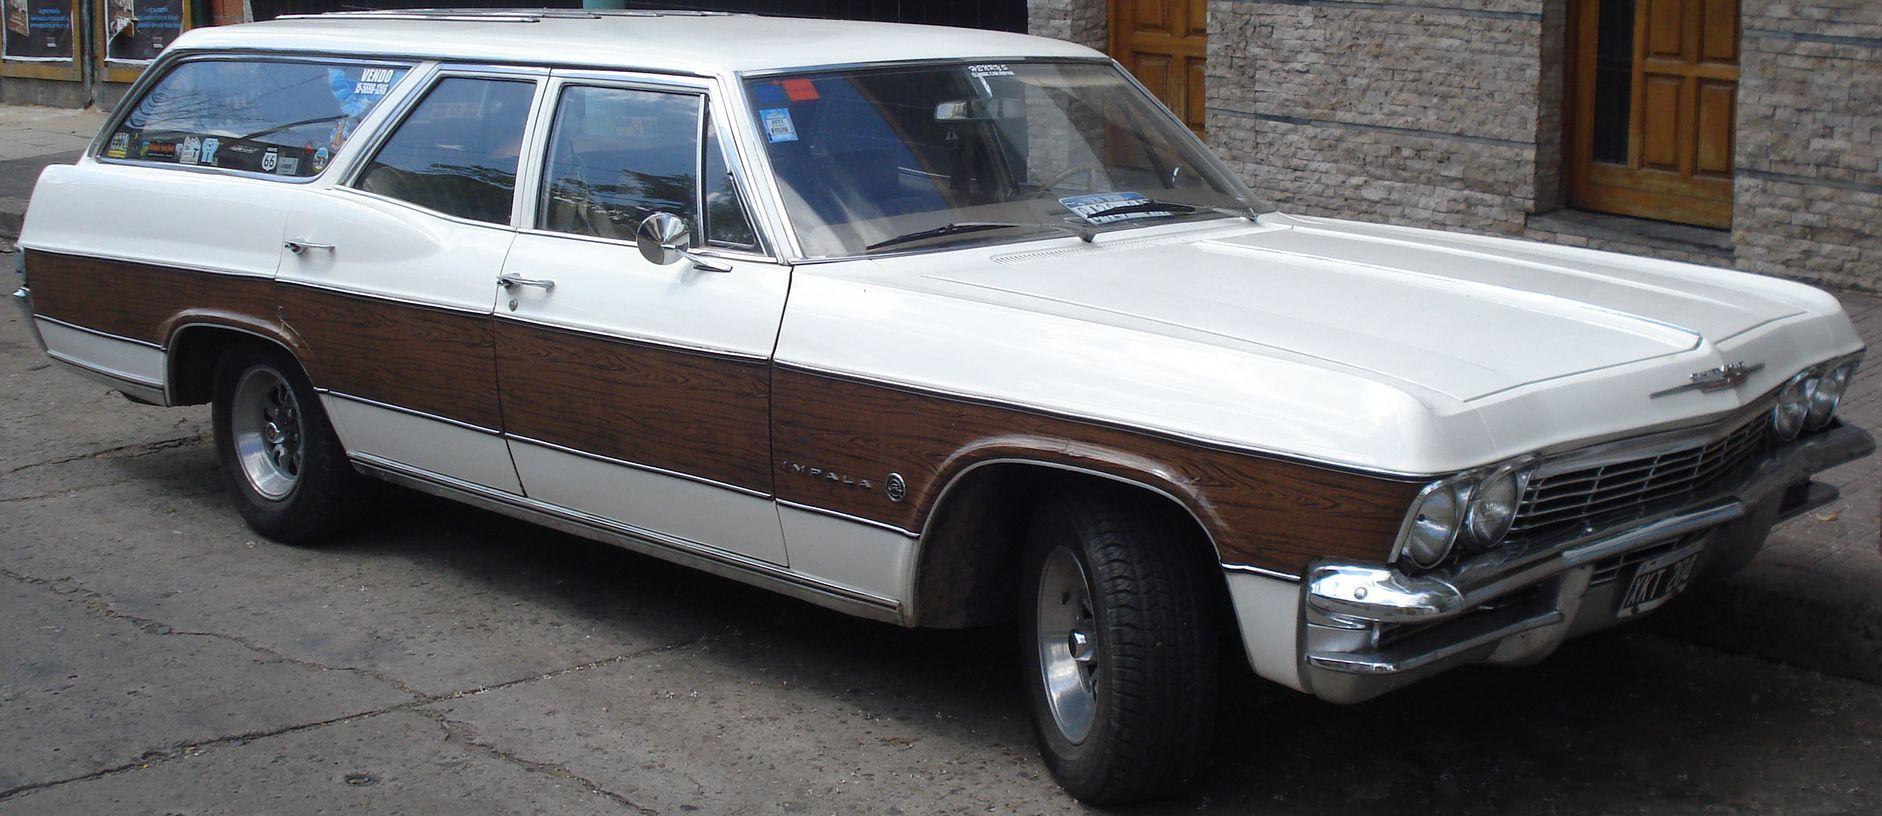 Chevrolet Impala Station Wagon Http Www Arcar Org Chevrolet